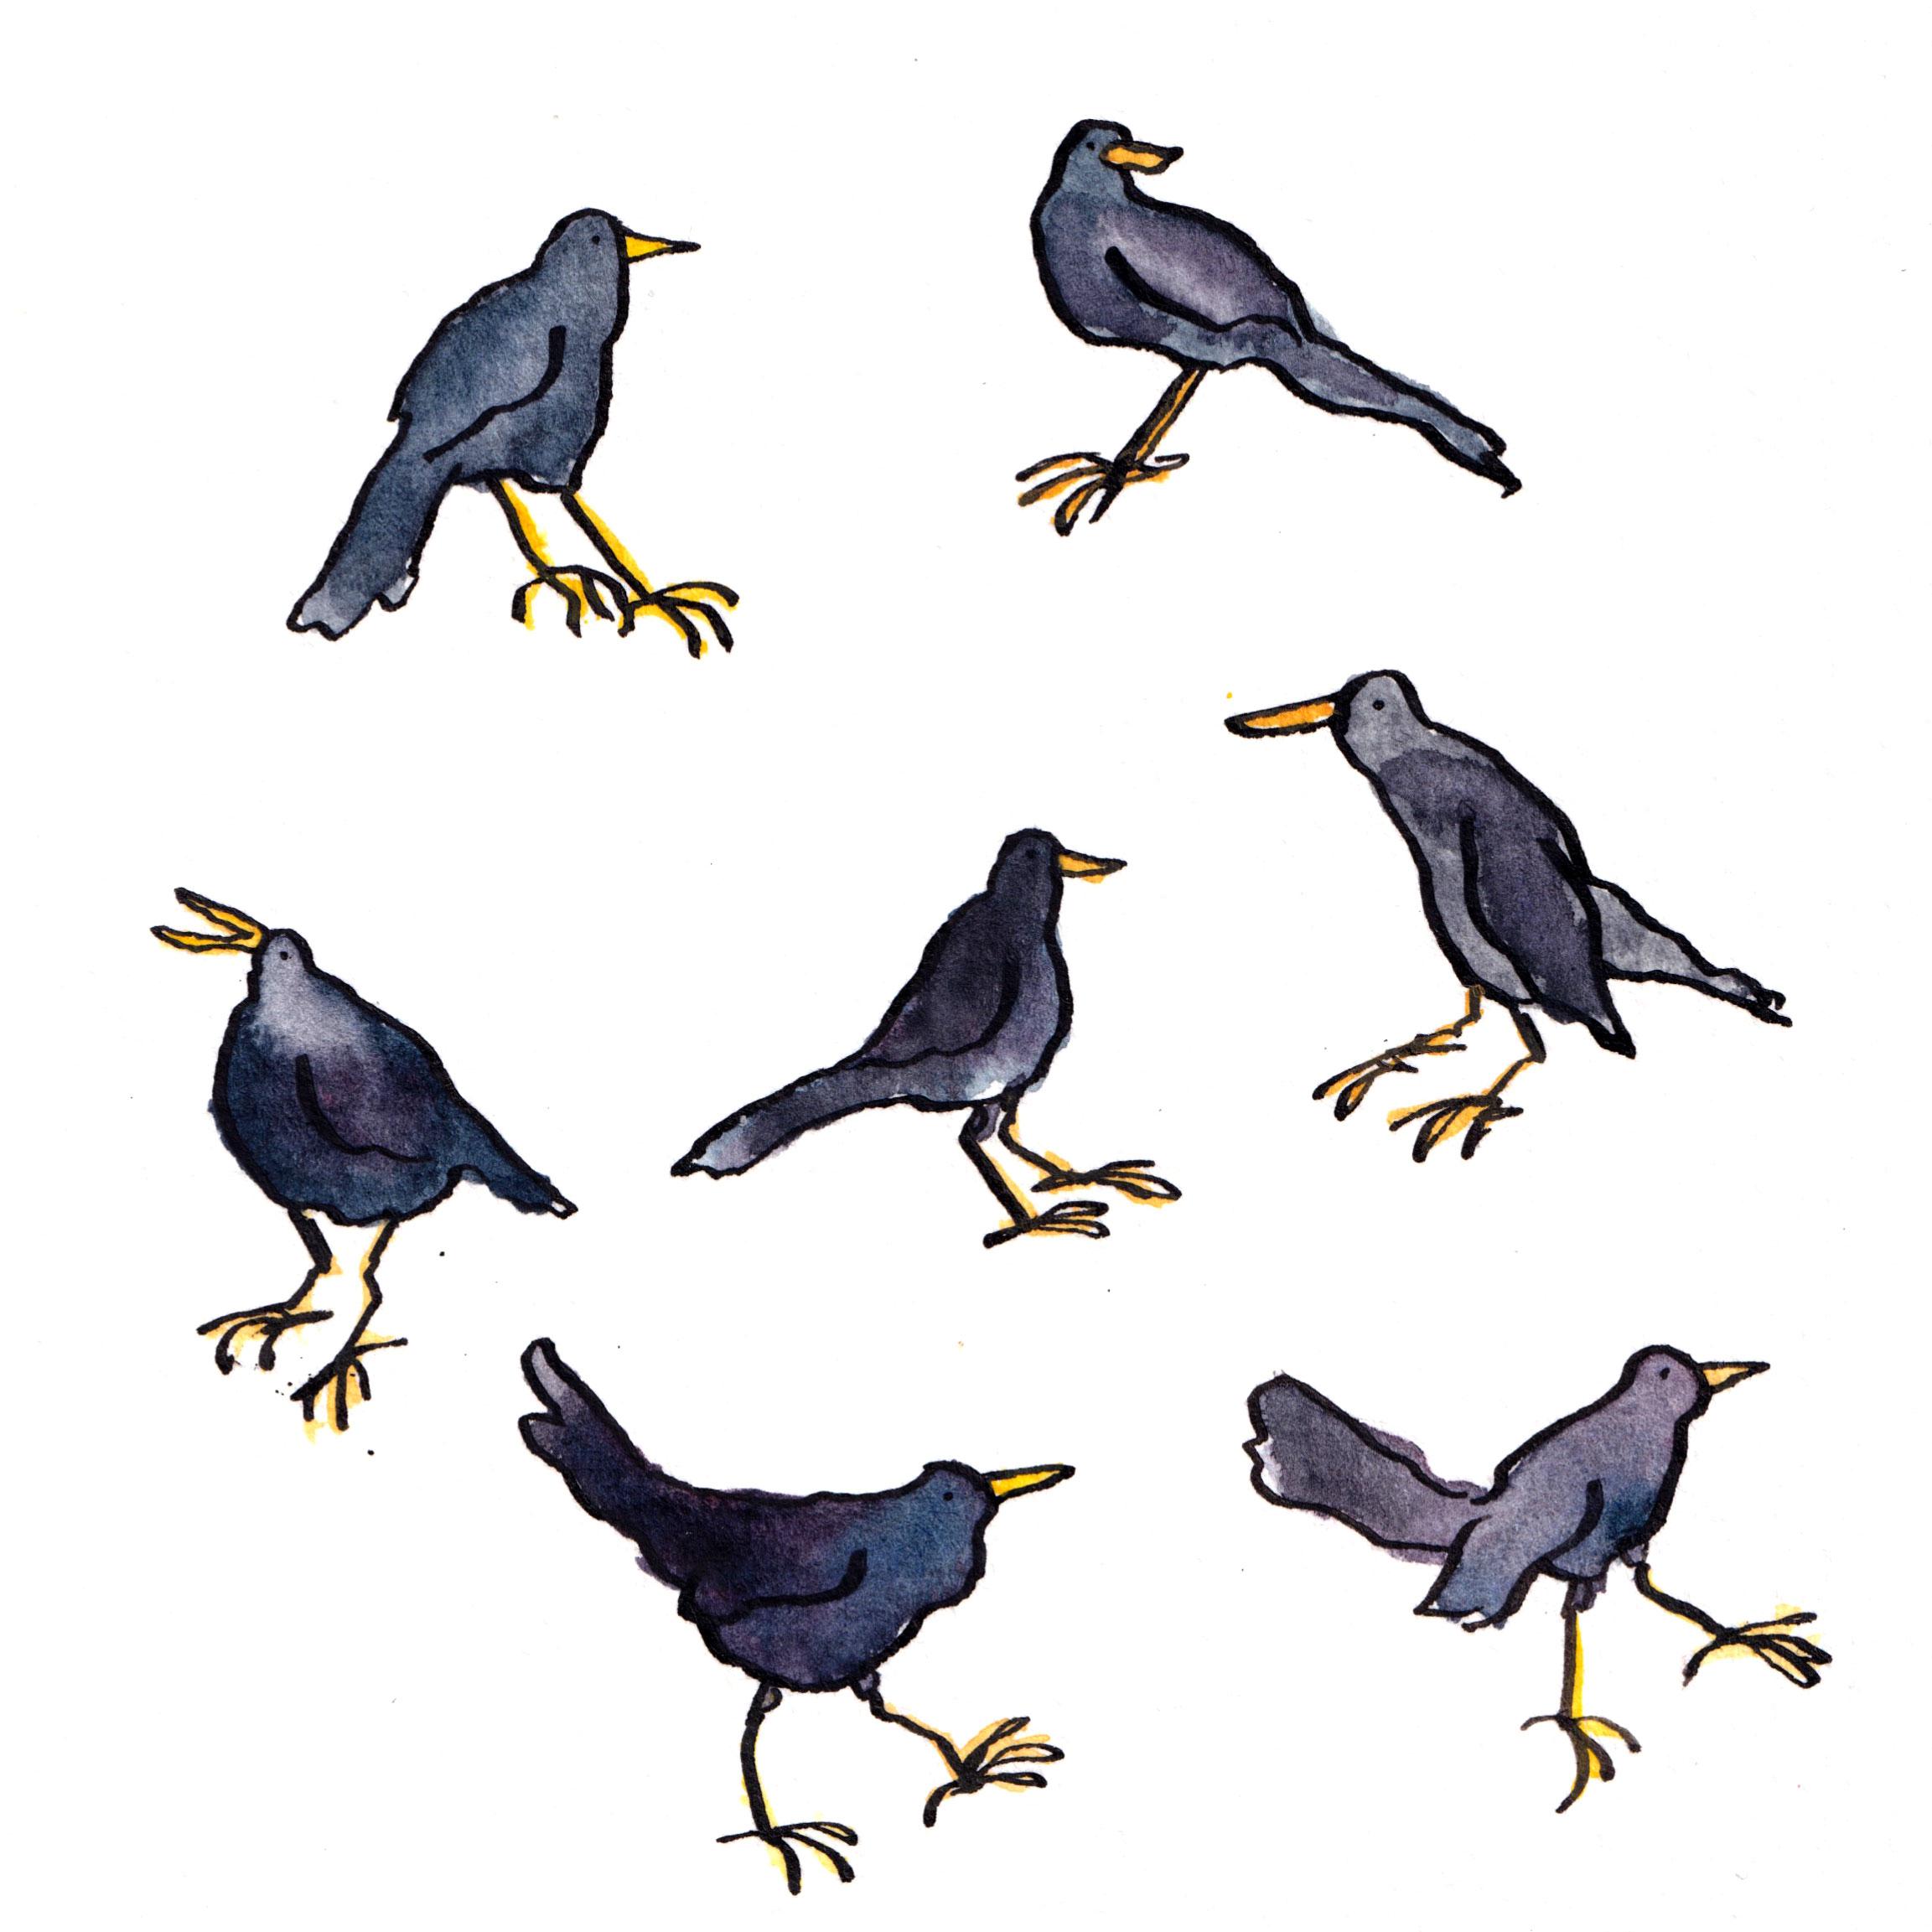 Watercolour drawing of seven tiny blackbirds